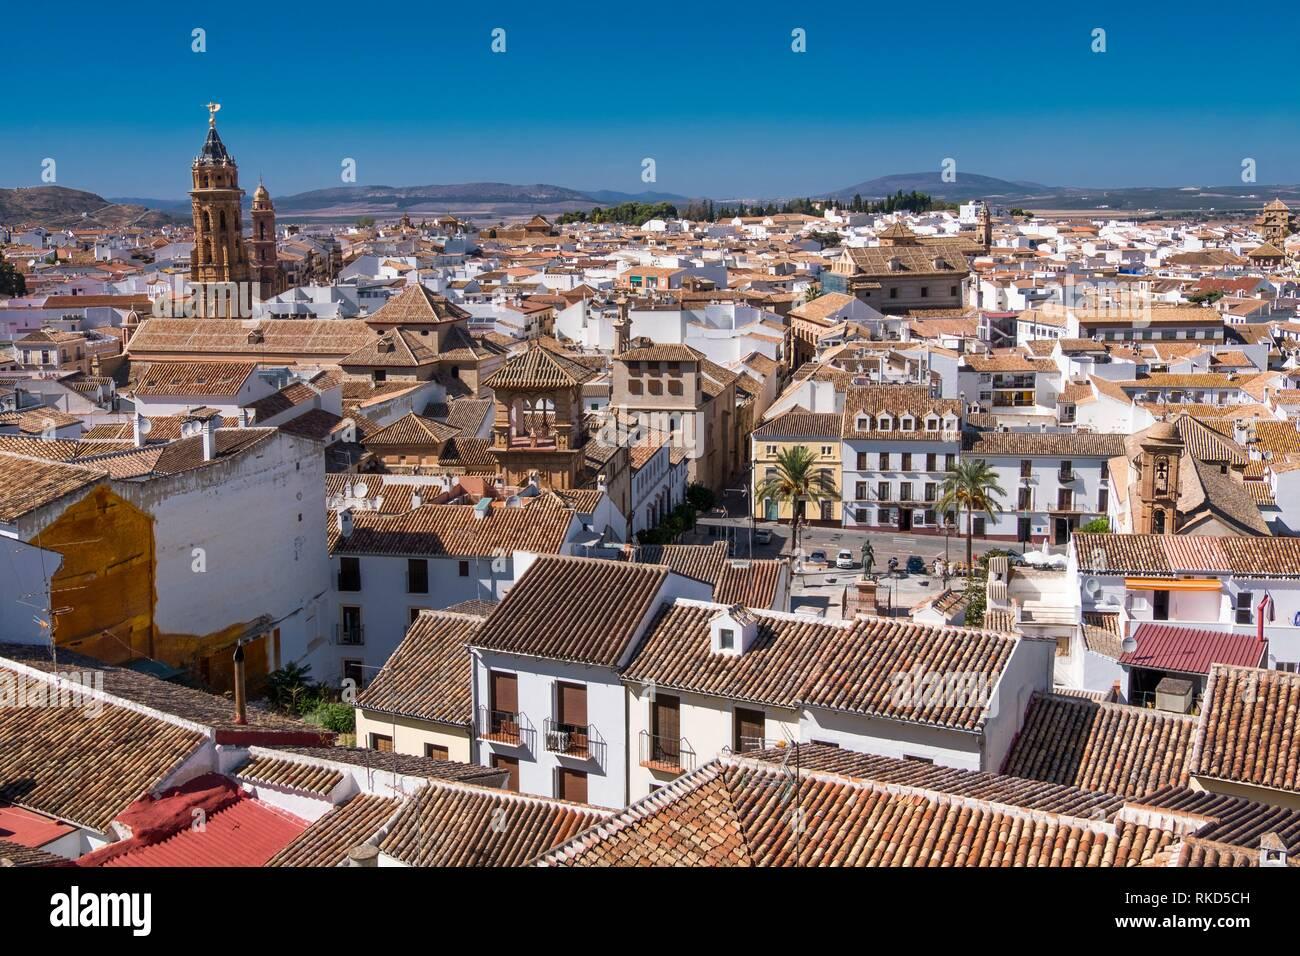 Spain, Andalusia, Malaga Province, Antequera - Stock Image